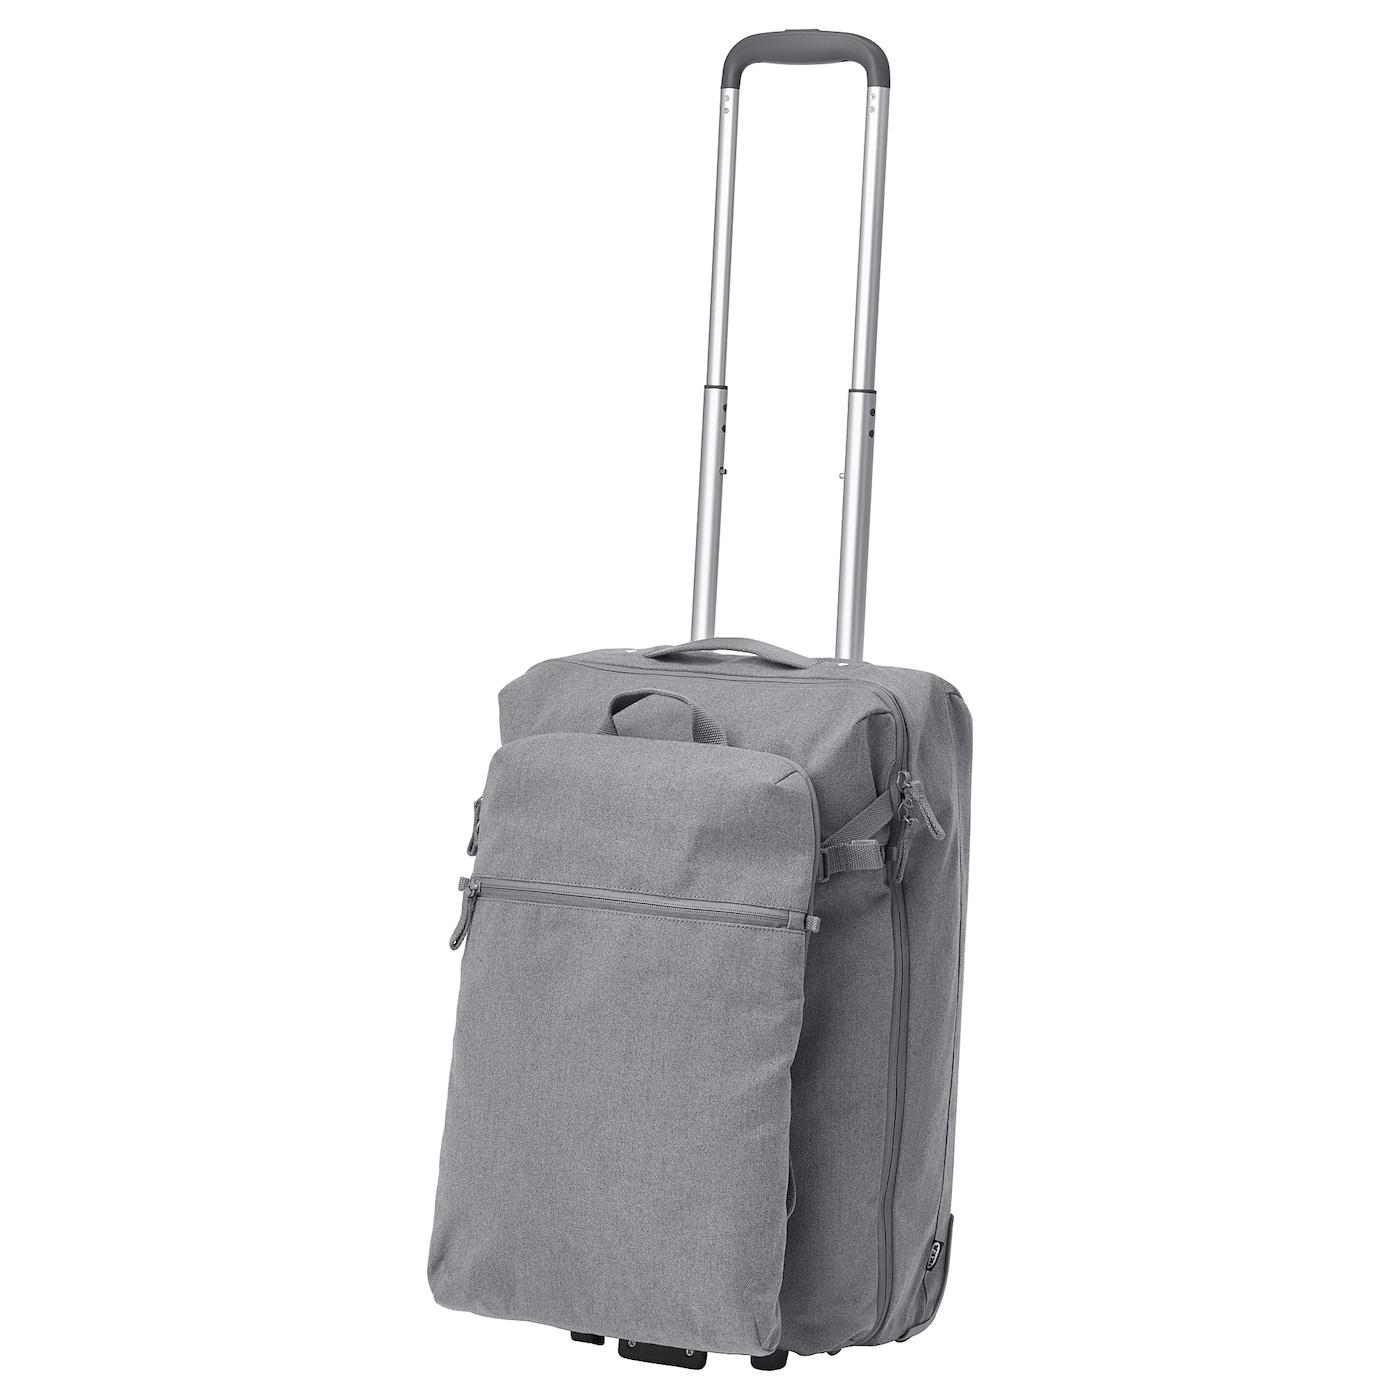 Carry On Bag Wheels And Backpack FÖrenkla Light Gray